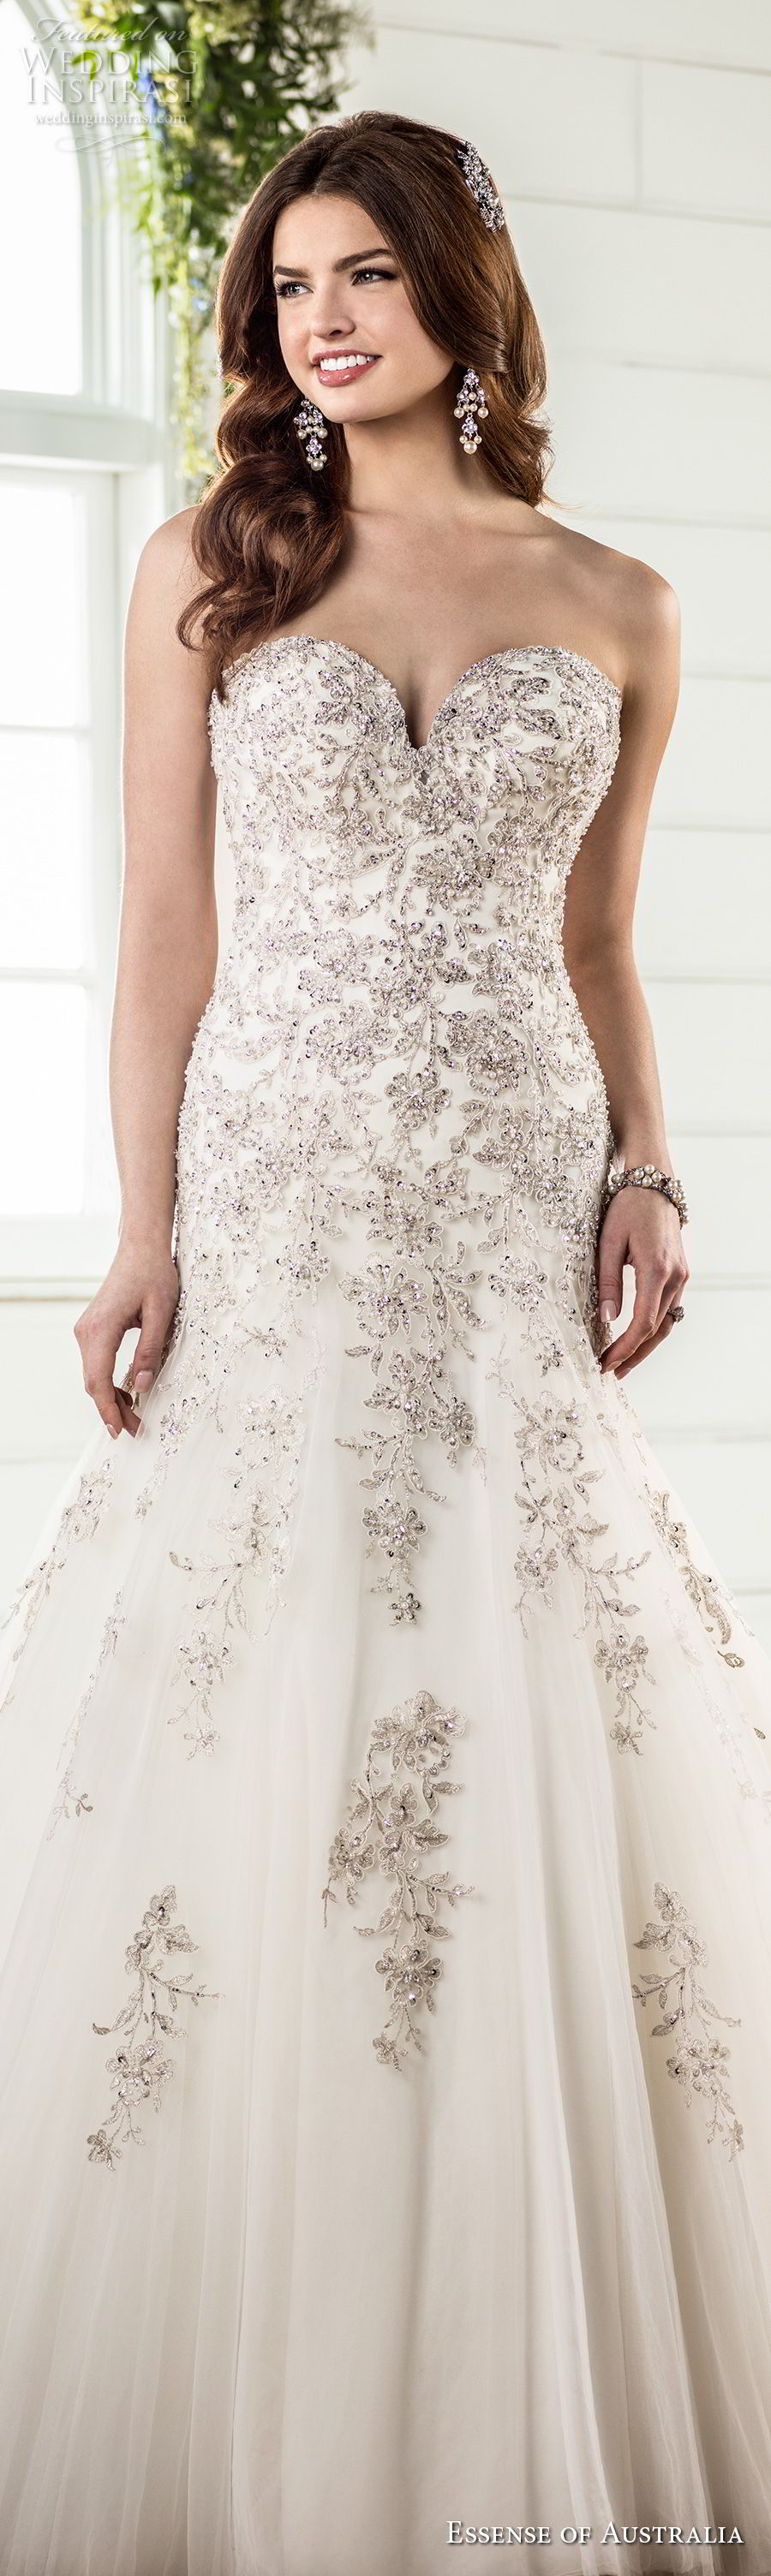 Dropped Waist Wedding Gowns 99 Elegant essense australia fall bridal